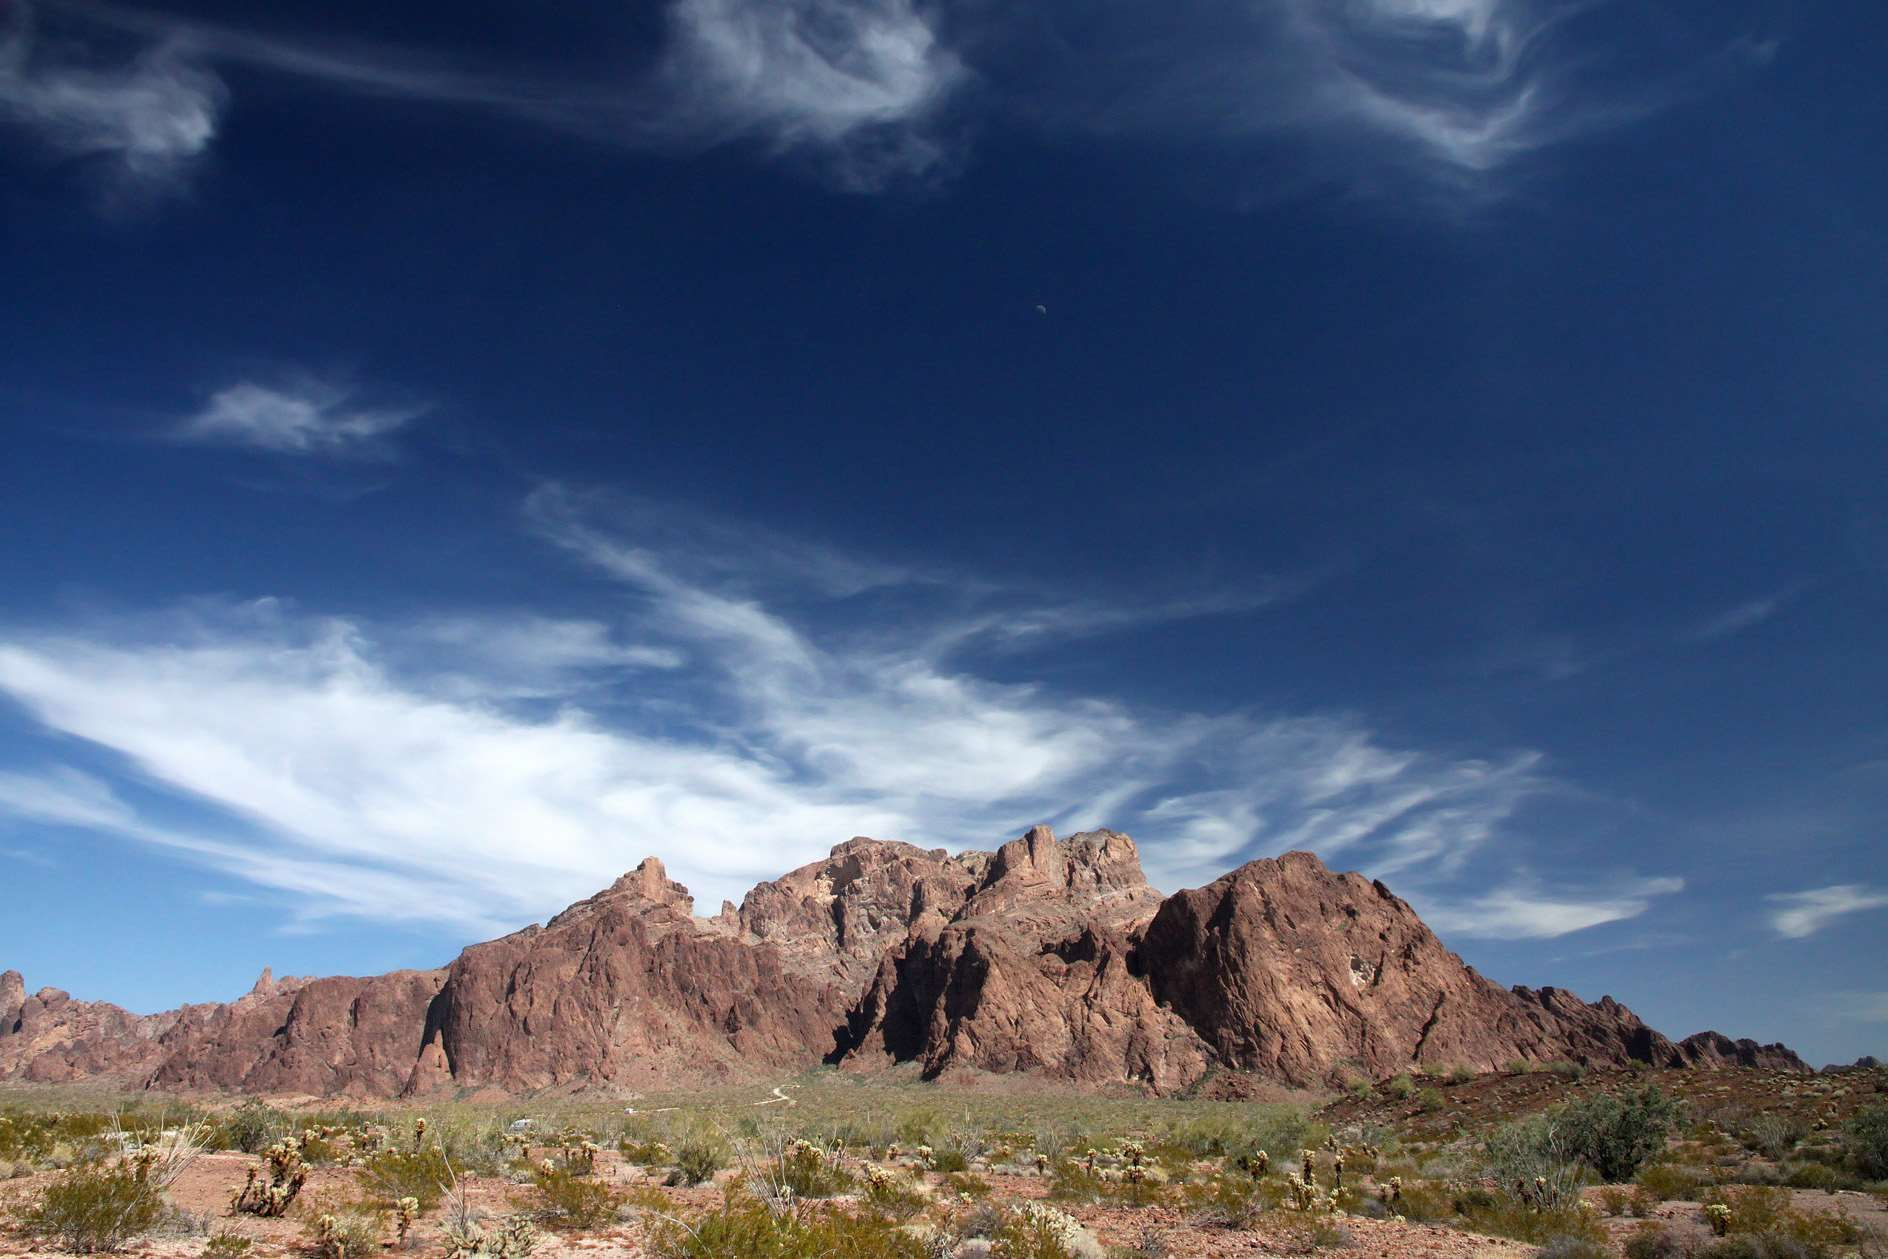 Arid Barren Desert Landscape Mountain Nature Outdoors Rocky Rocky Mountain Scenic Sky Scenic Scenic Photos Scenic Travel